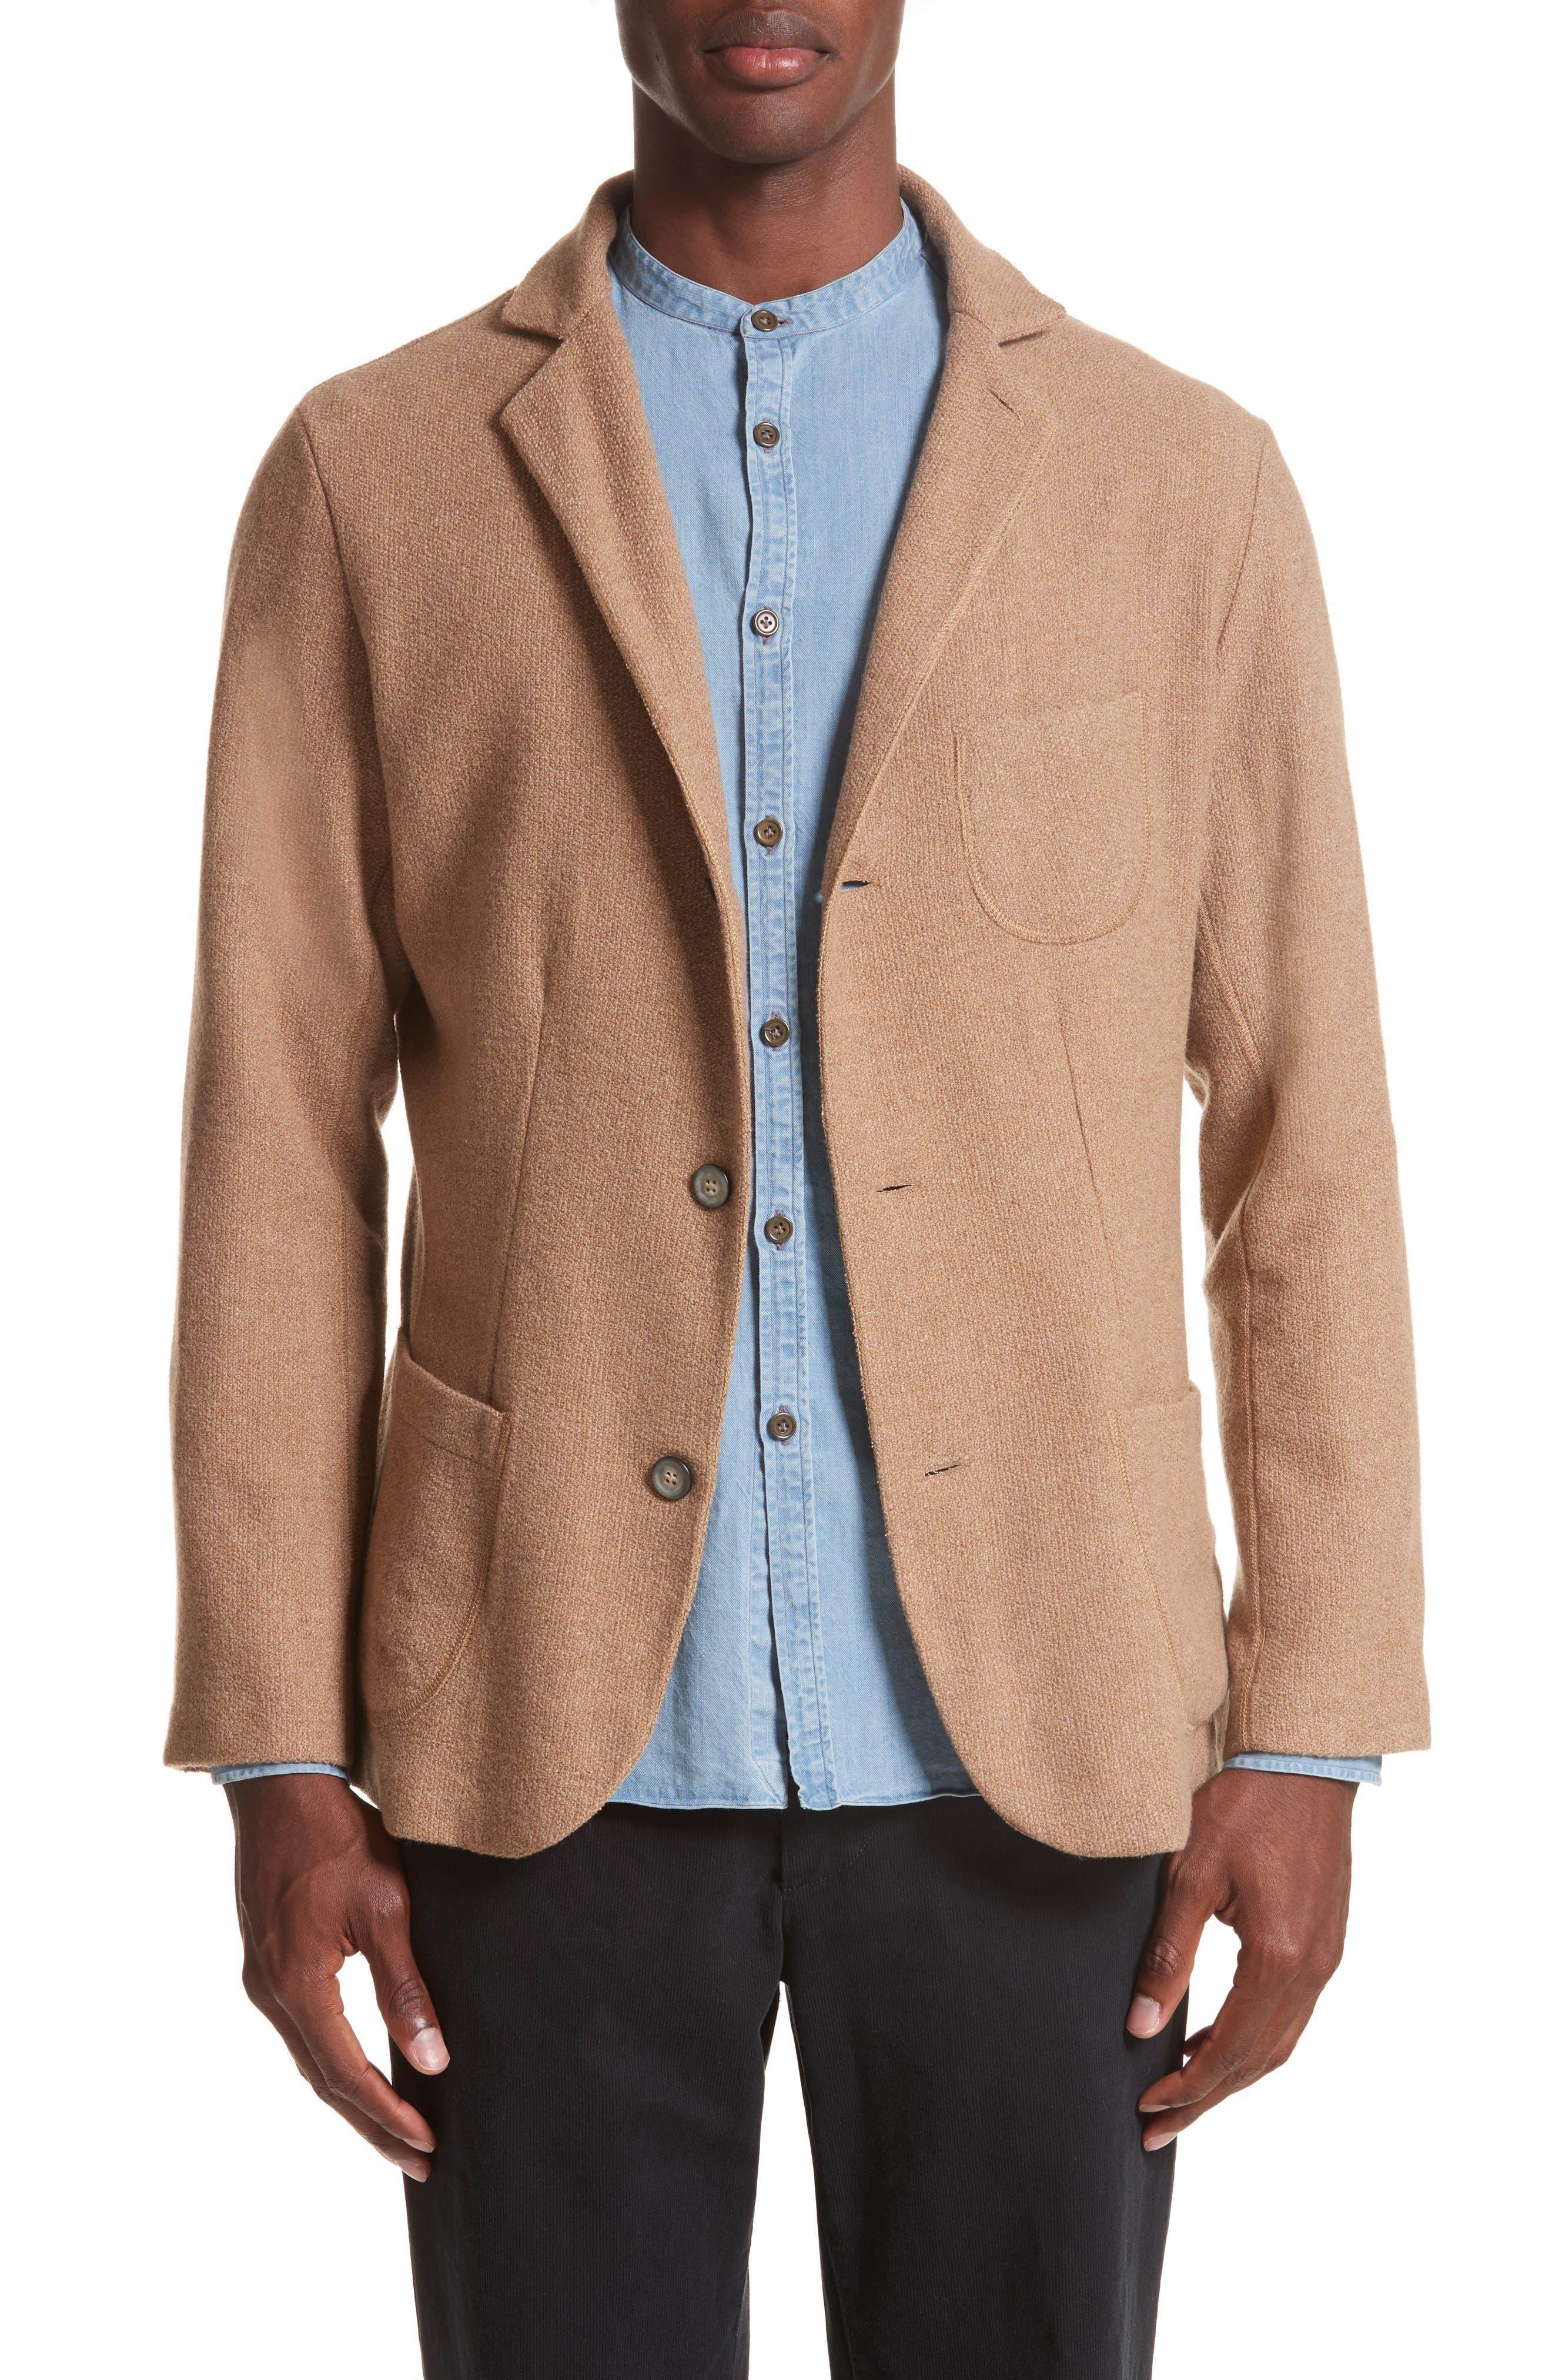 Nicola Camel Knit Wool Blazer,                         Main,                         color, Travertine